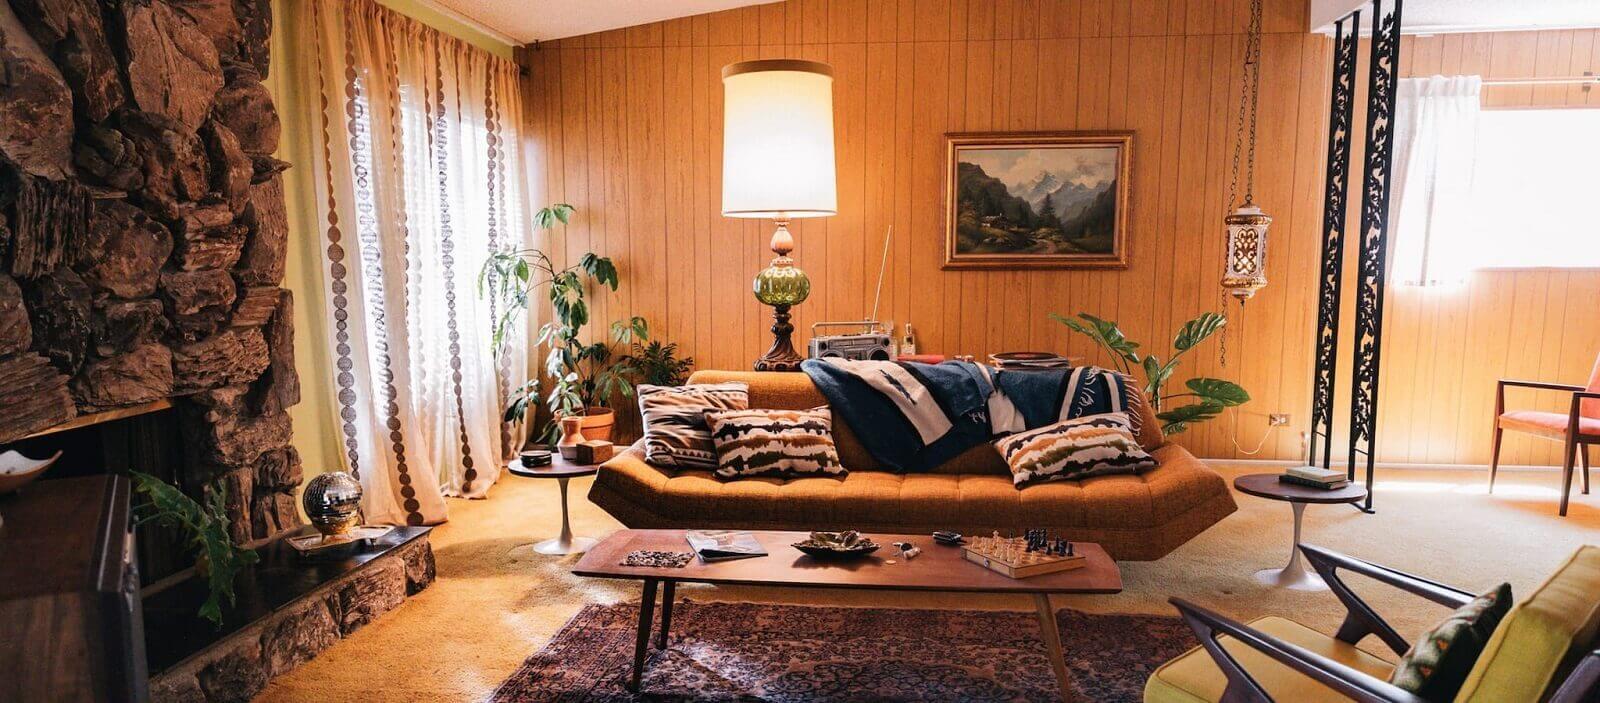 Top 10 Most Unique Filming Location - 60's Vintage House Honeymoon Hideout